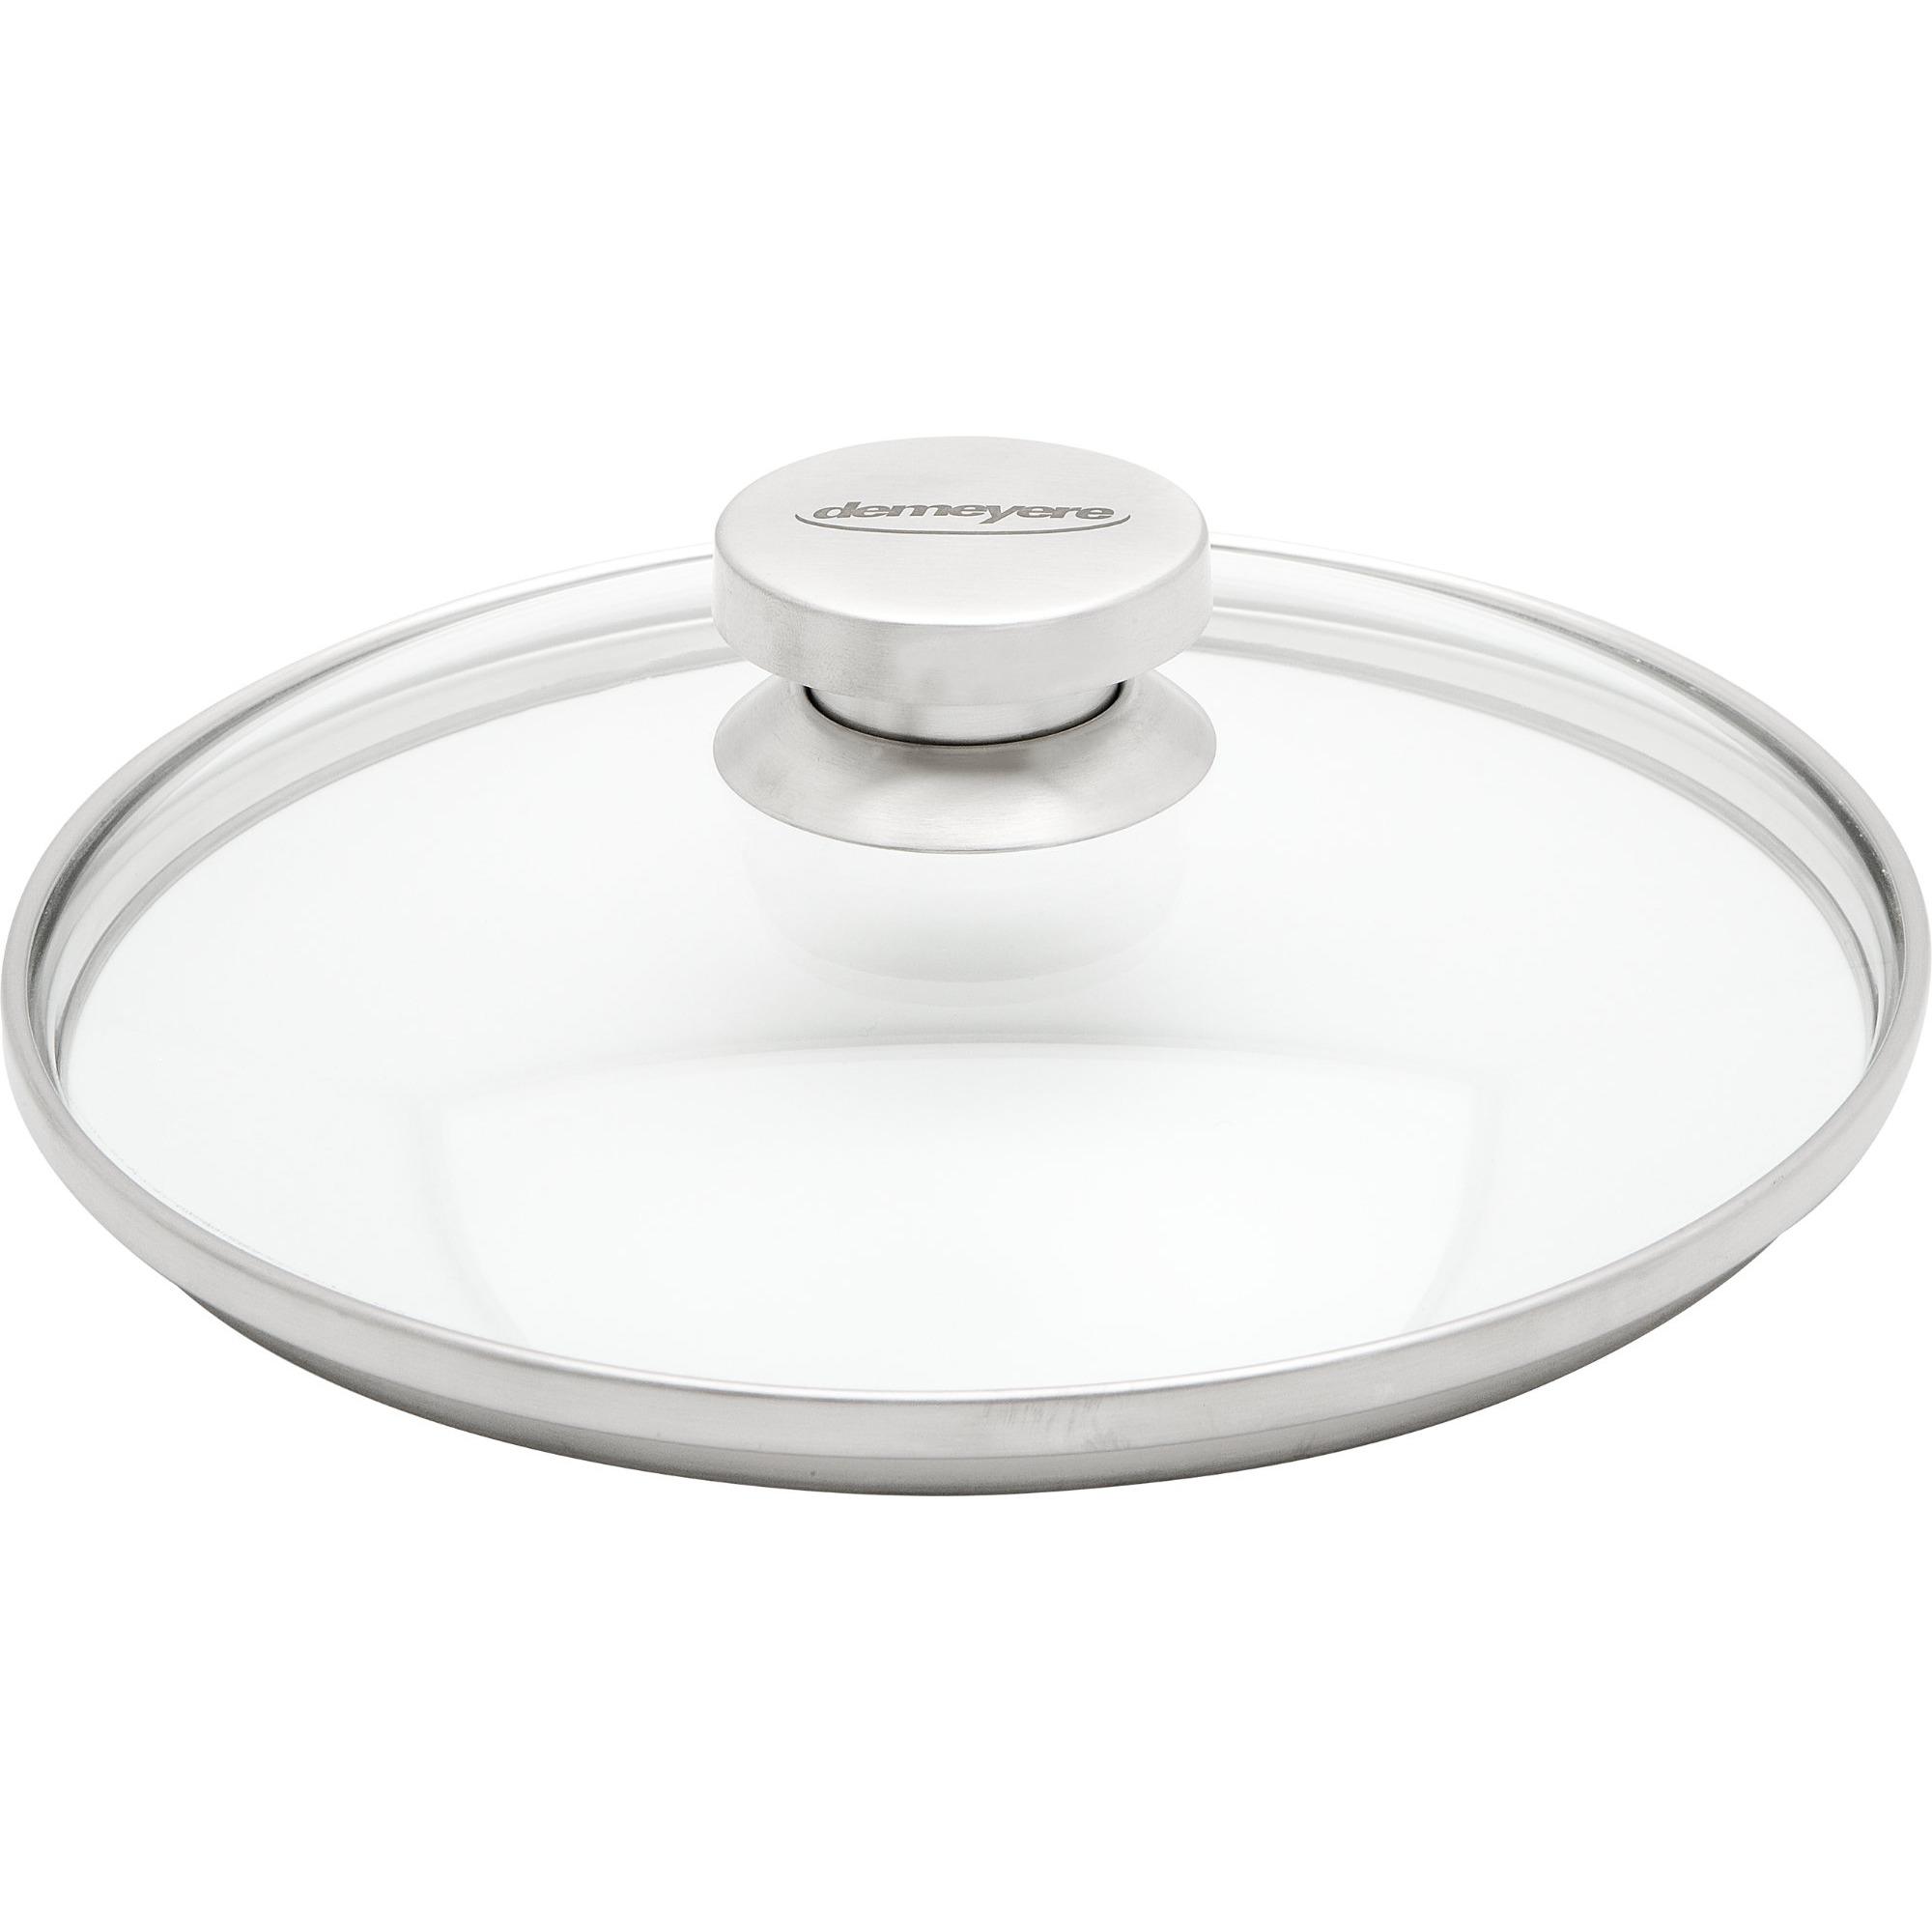 Demeyere Glaslock Stålknopp 22 cm